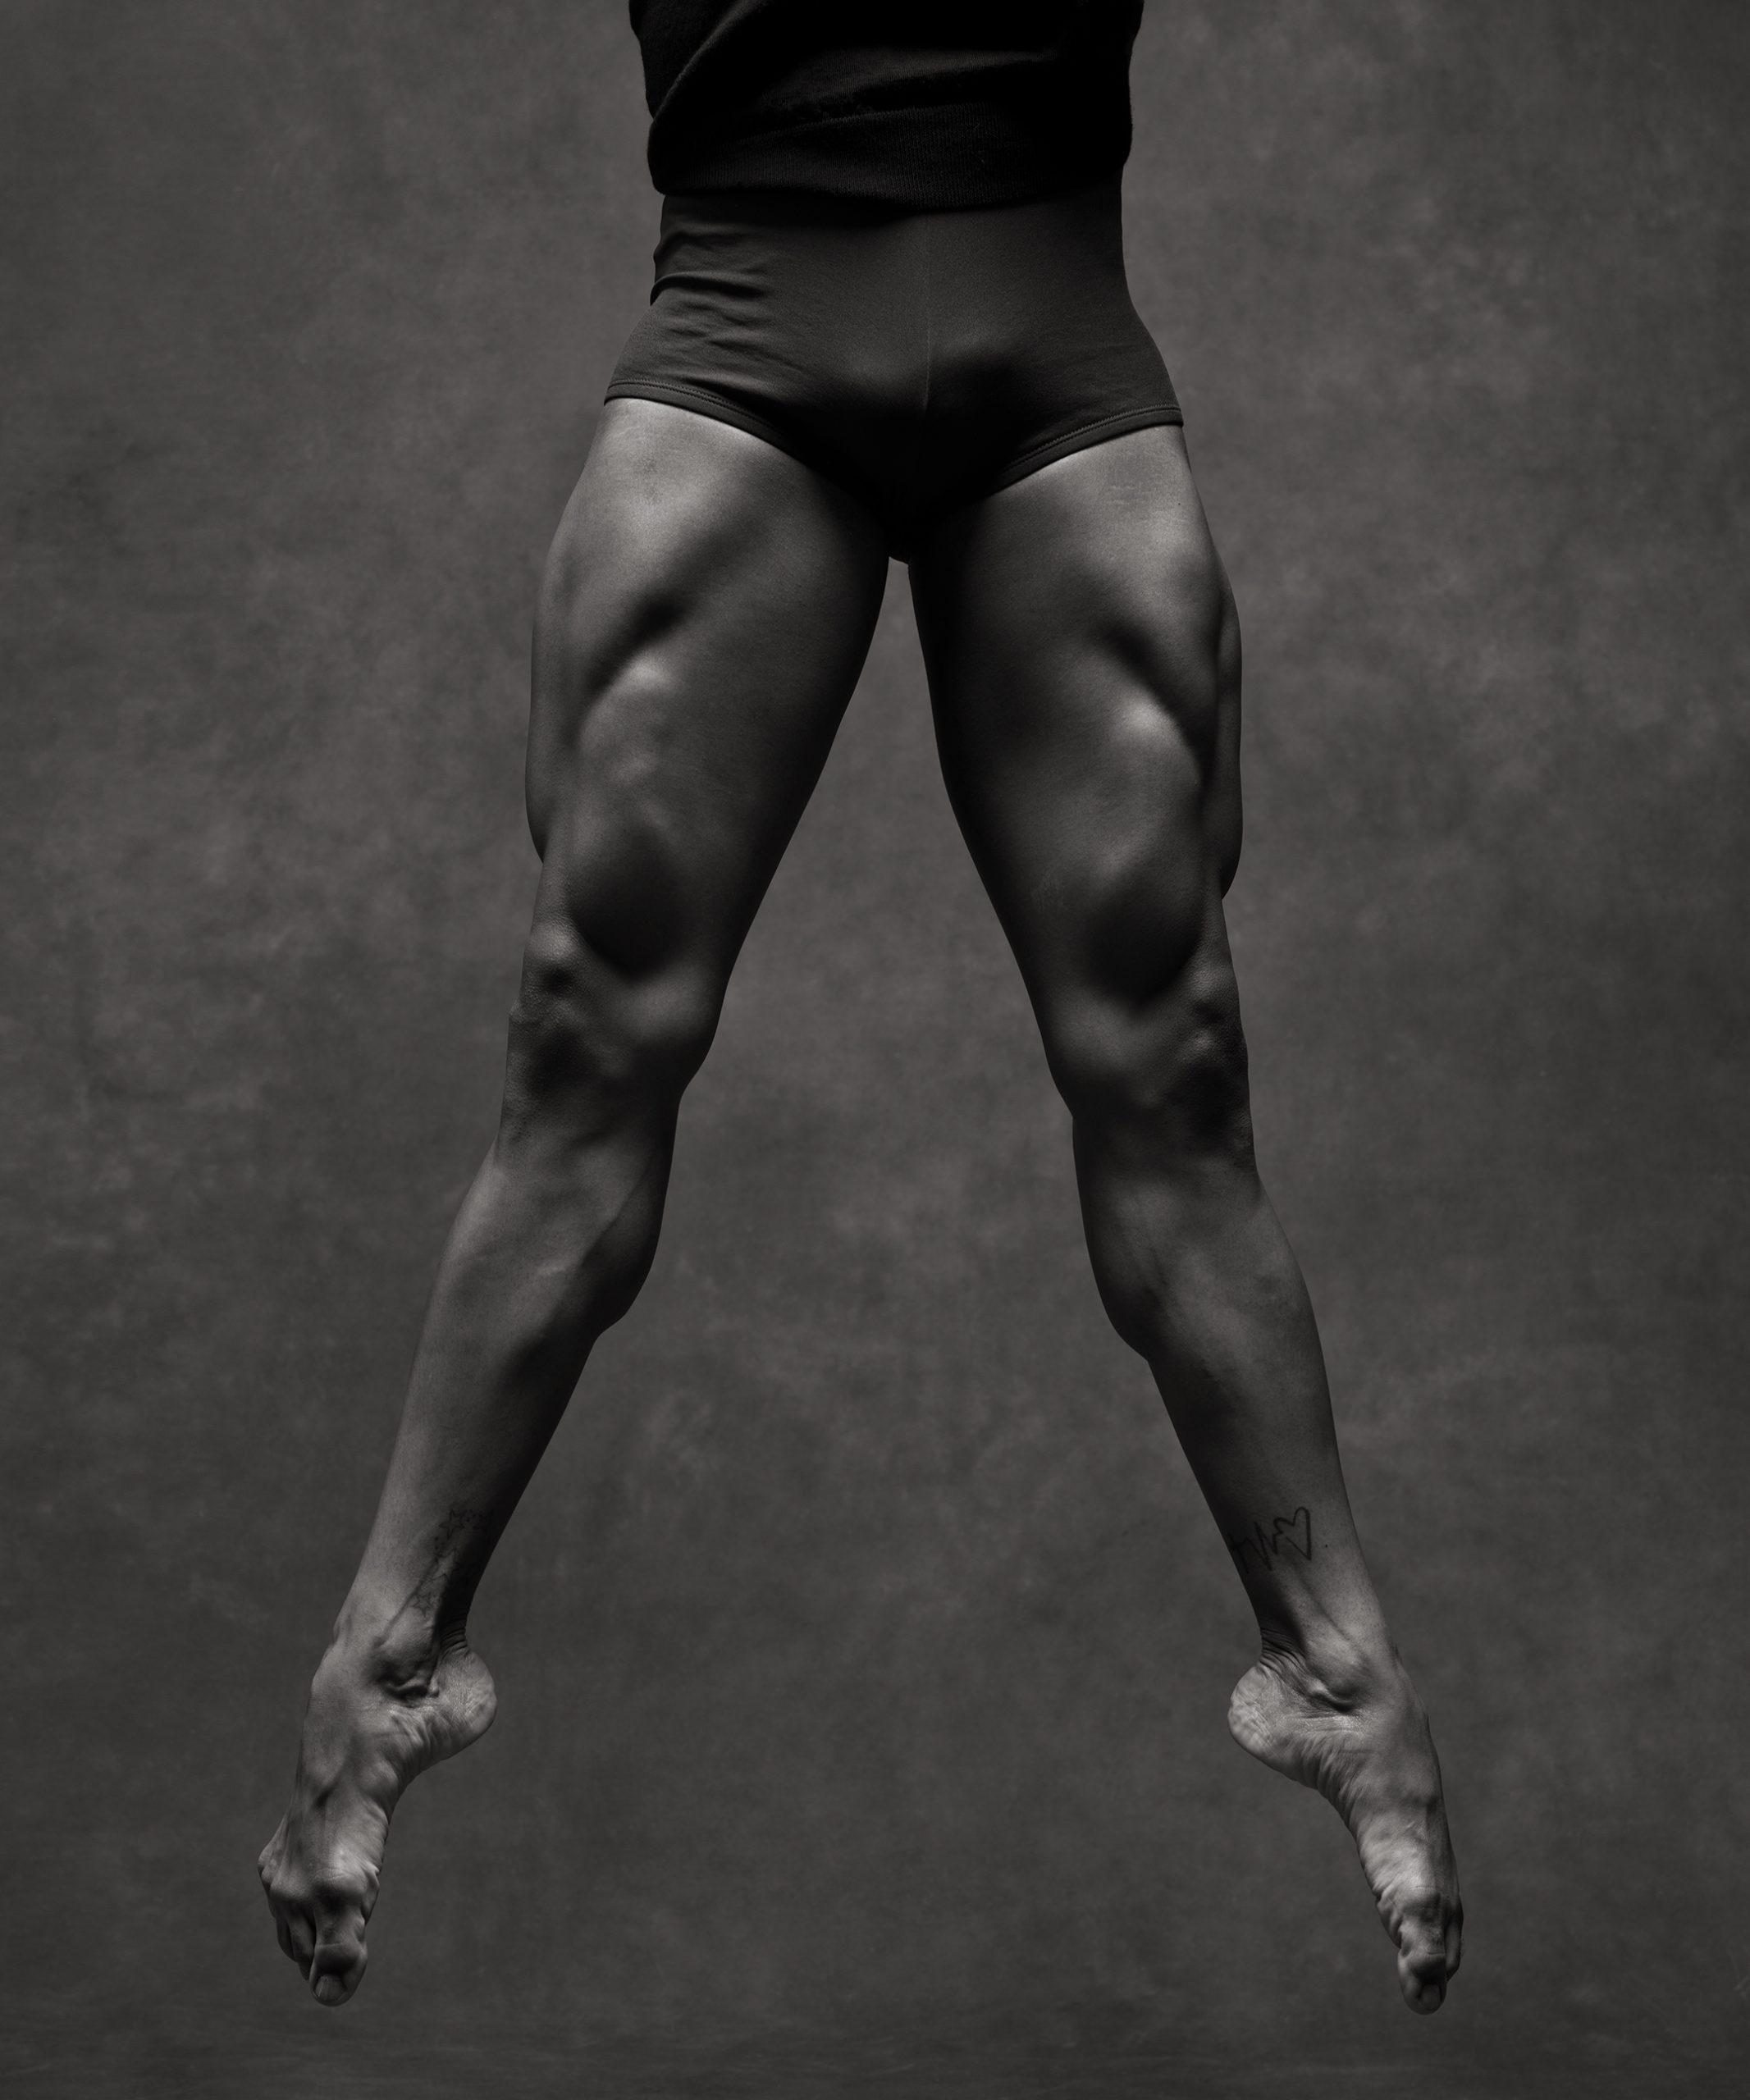 Daniel Harder, Alvin Ailey American Dance Theater